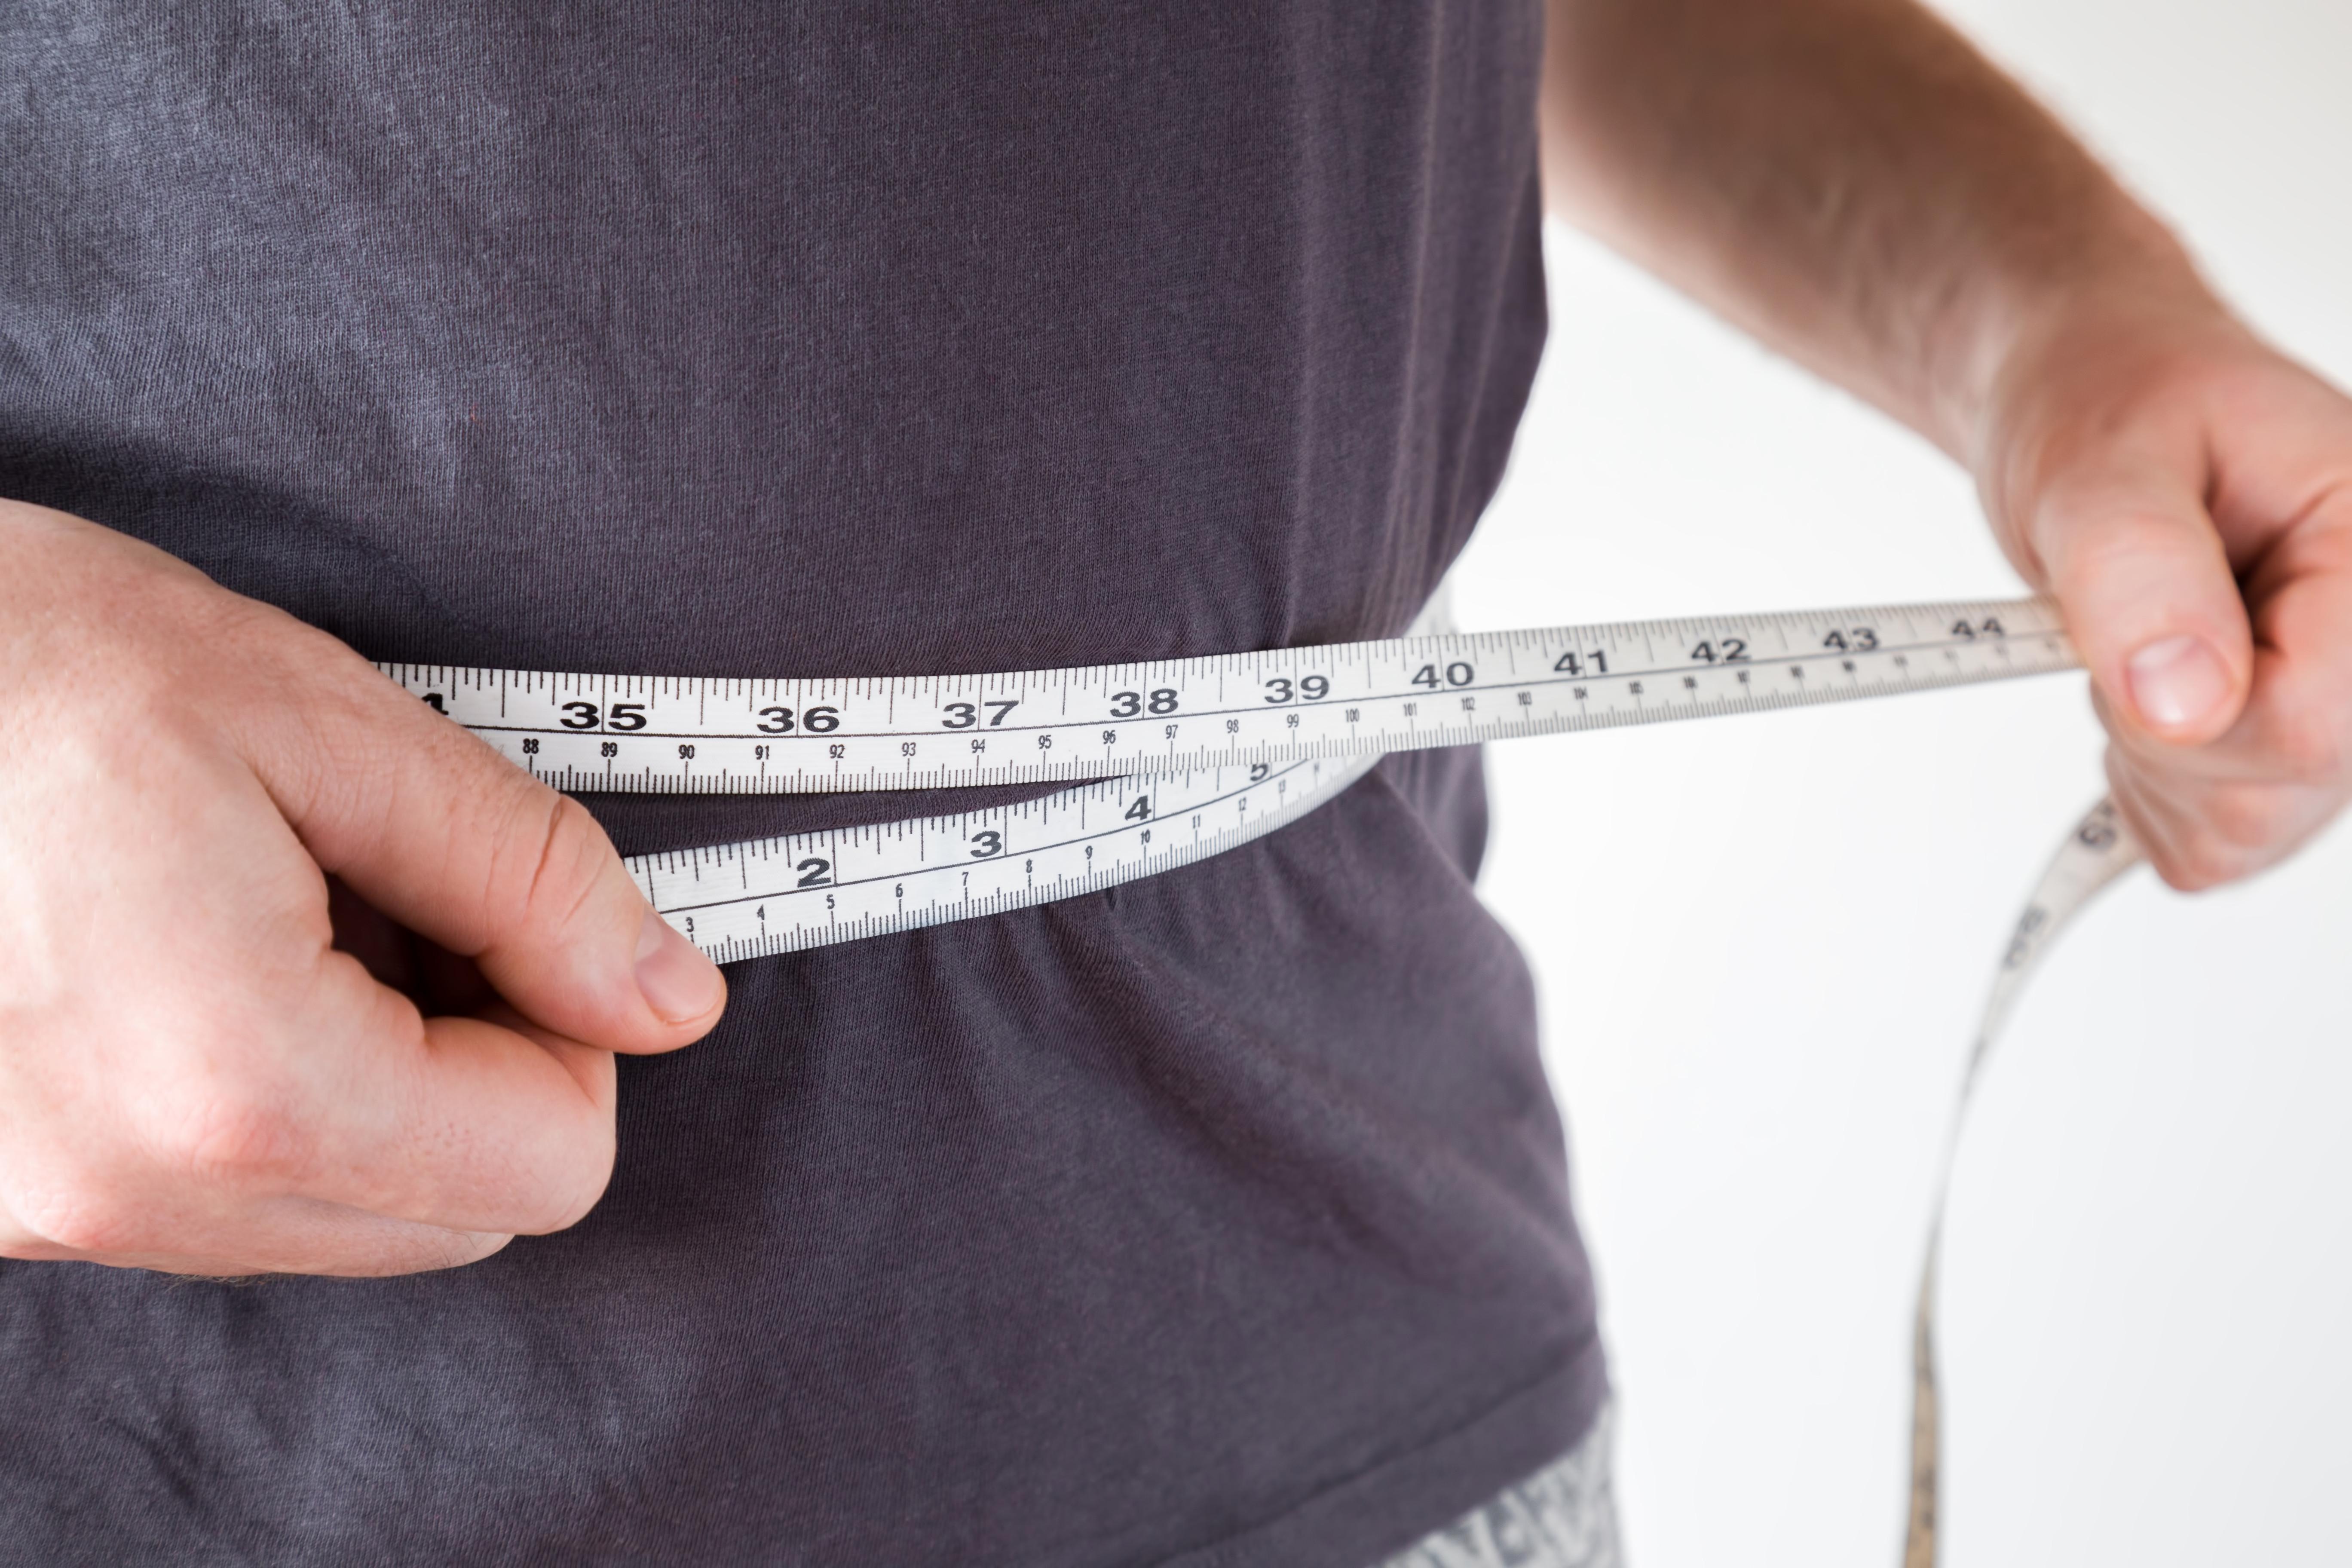 man-with-measuring-tape-around-his-waist